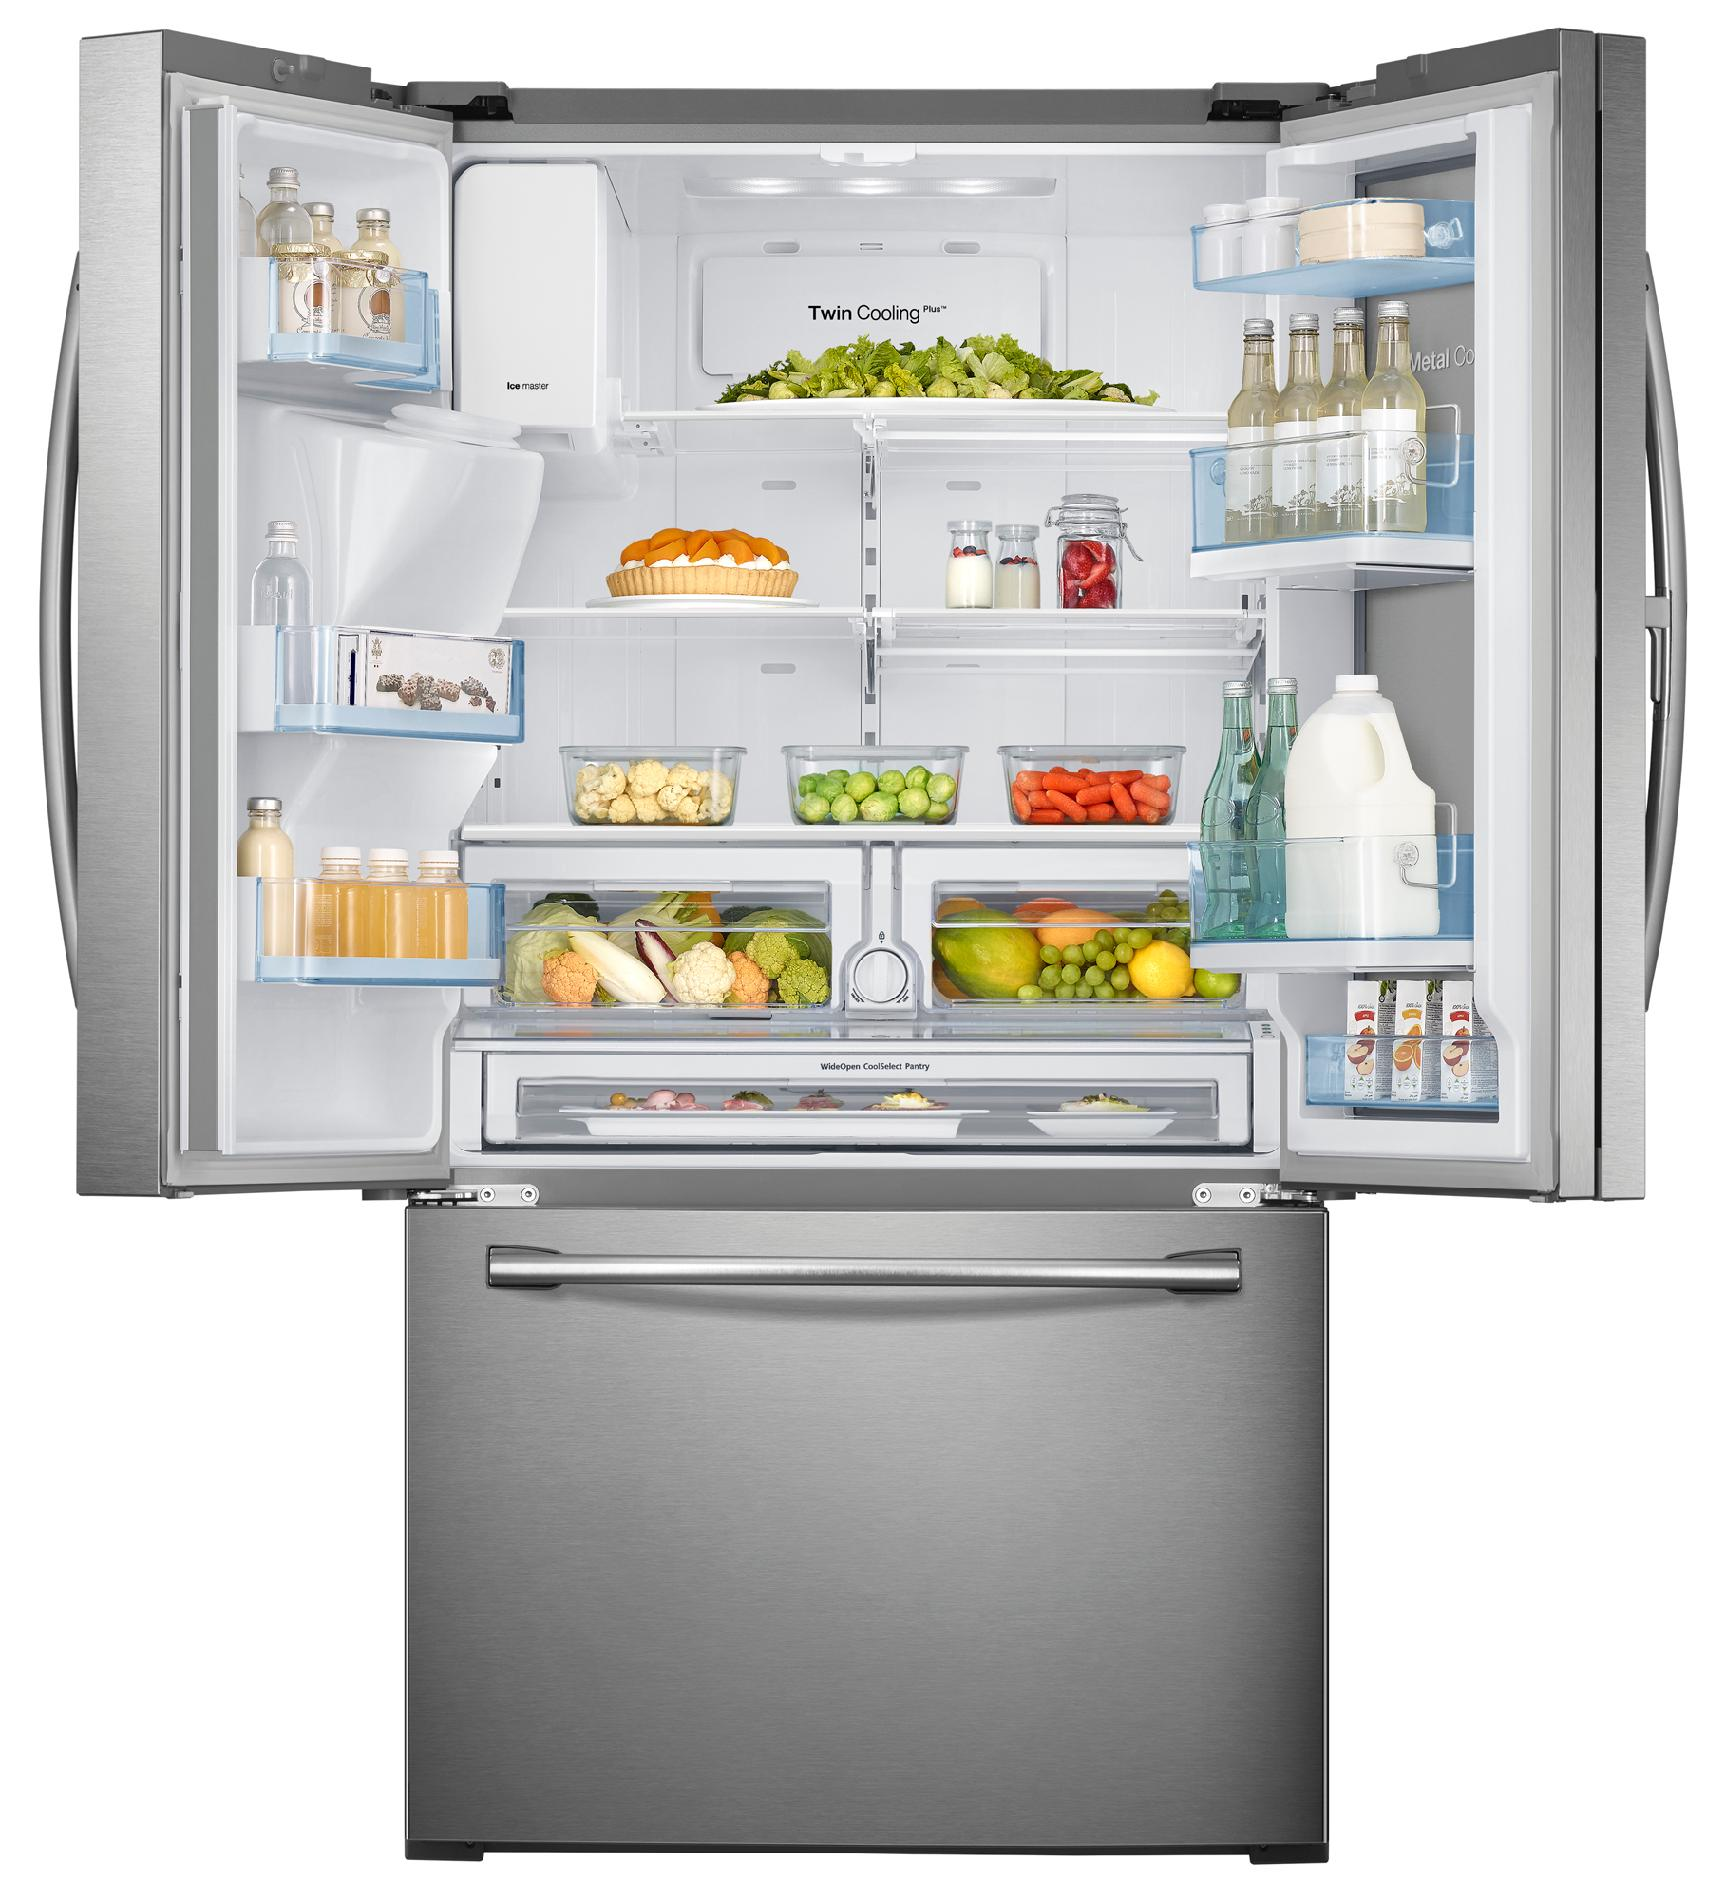 Samsung RF28HDEDBSR 28 cu. ft. Food ShowCase French Door Refrigerator - Stainless Steel